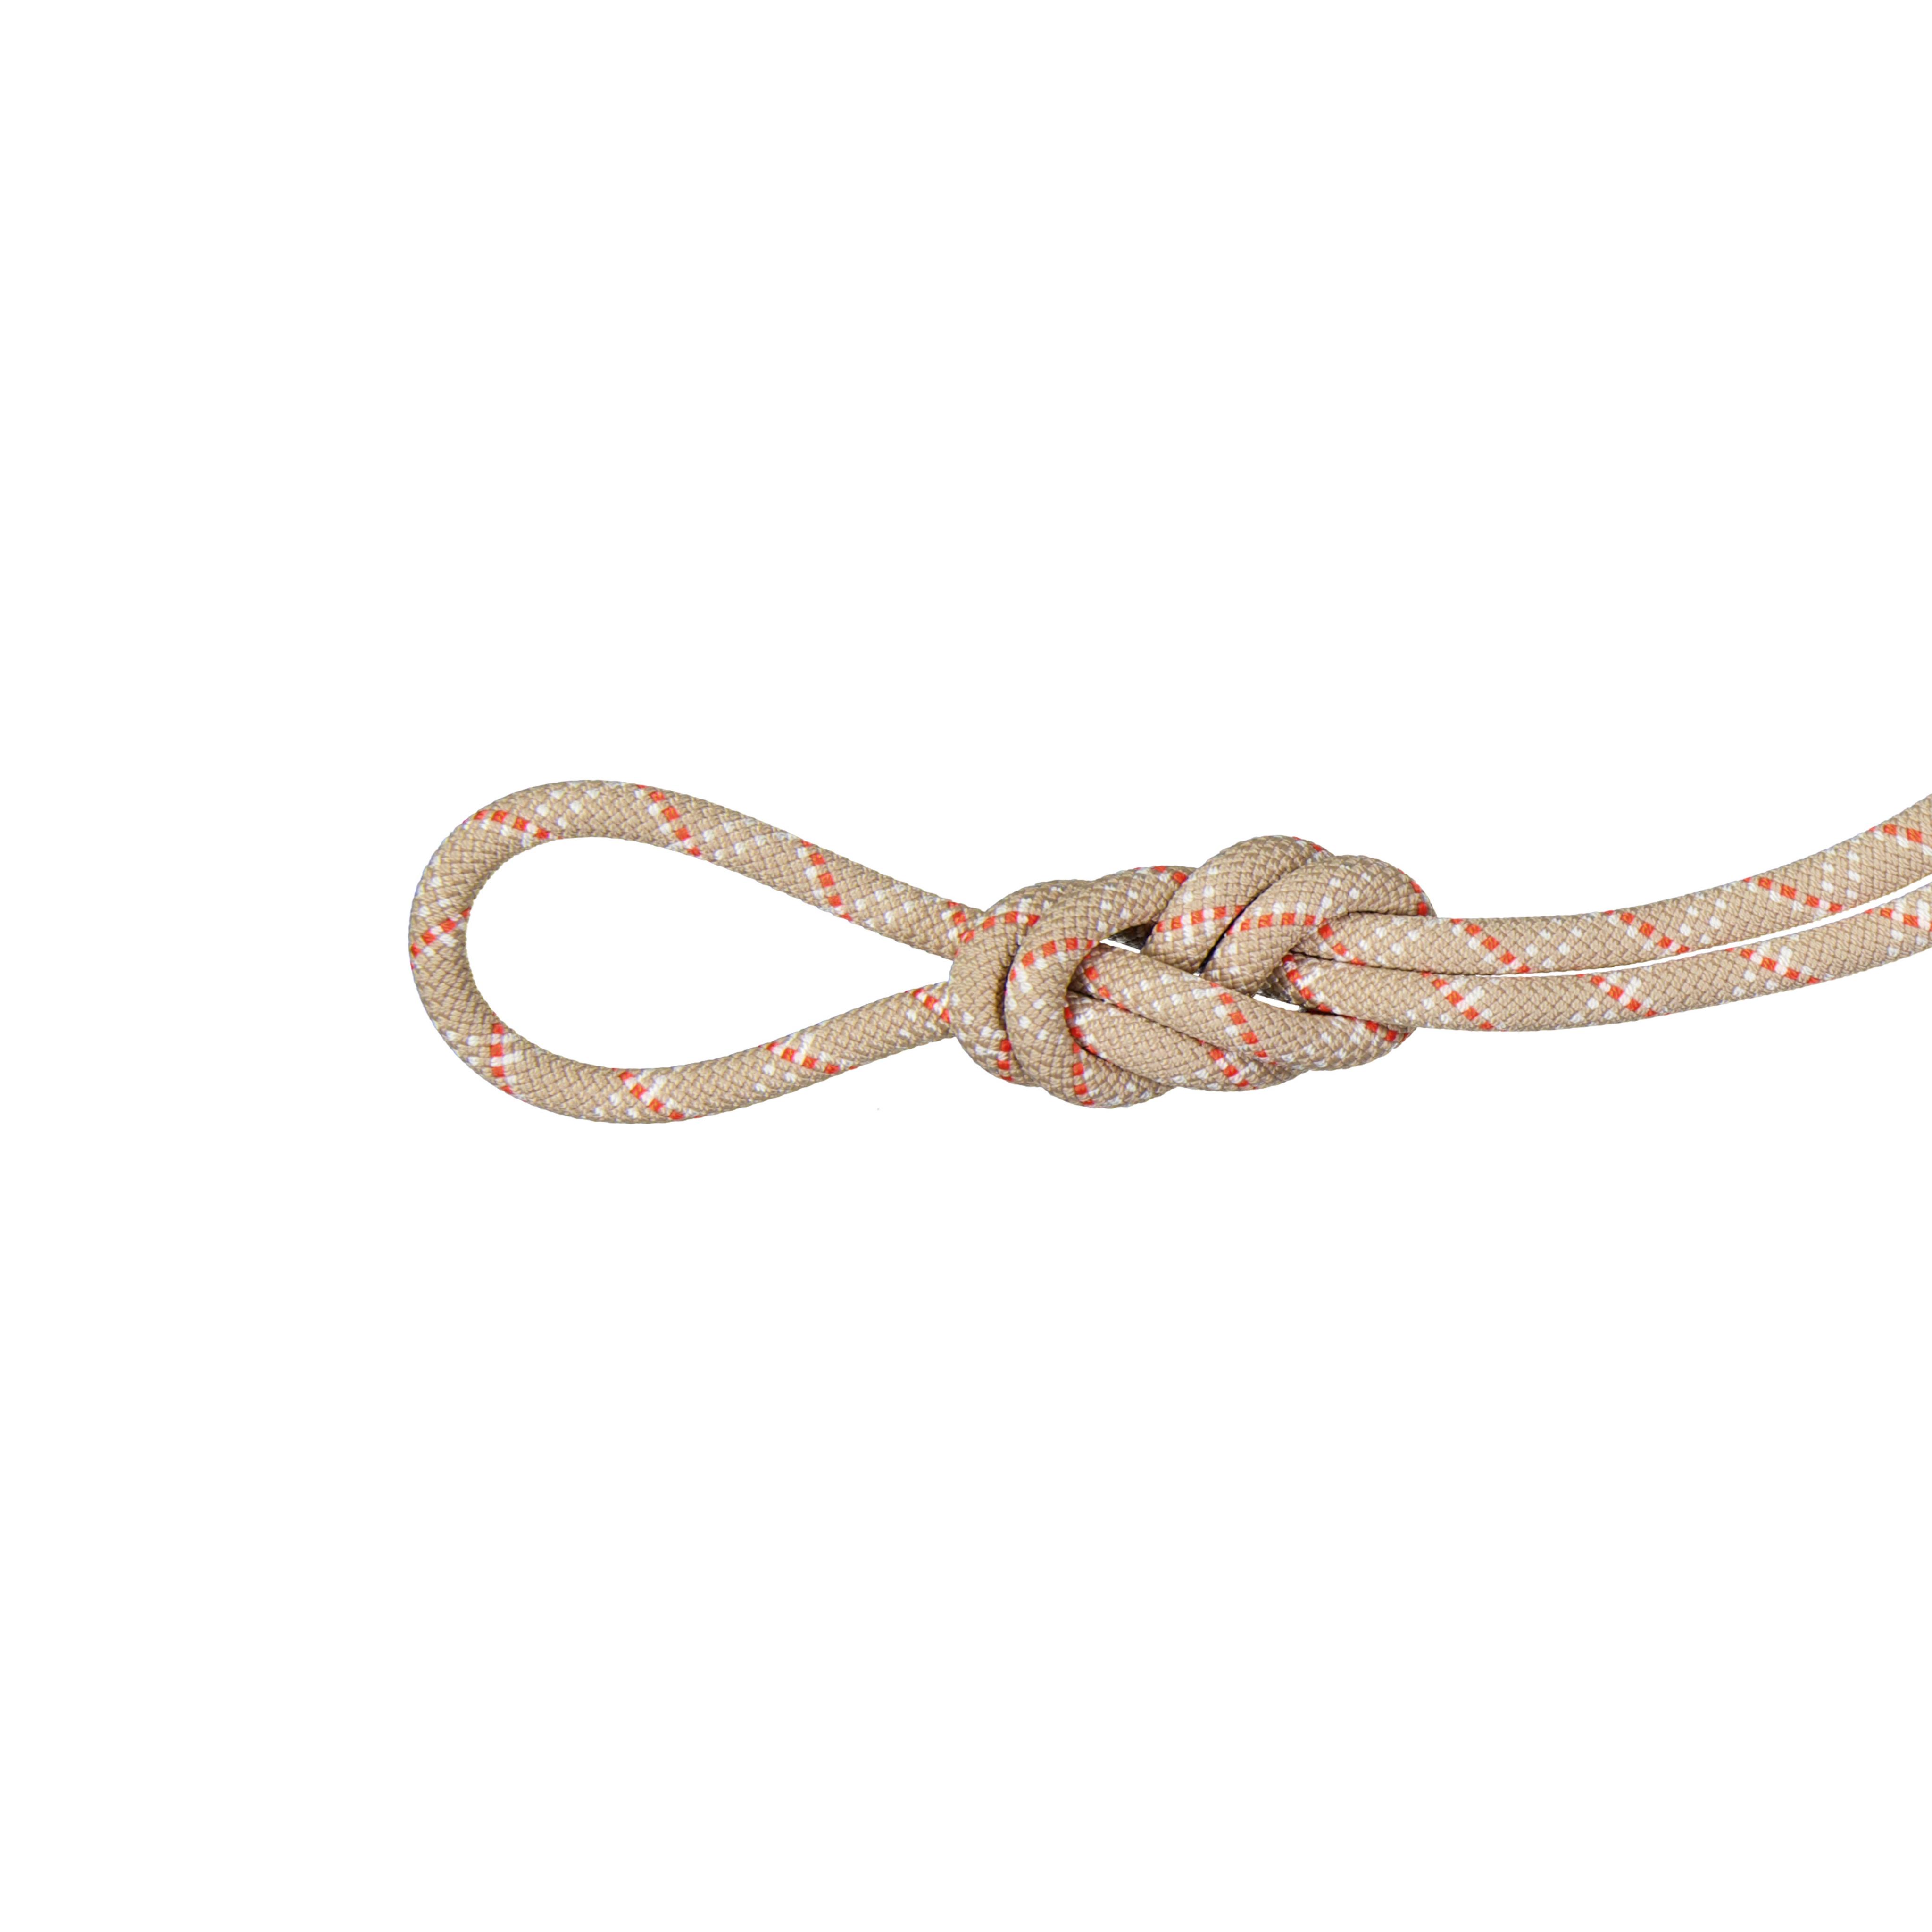 9.5 Gym Classic Rope - 40 m, Classic Standard, desert-white thumbnail